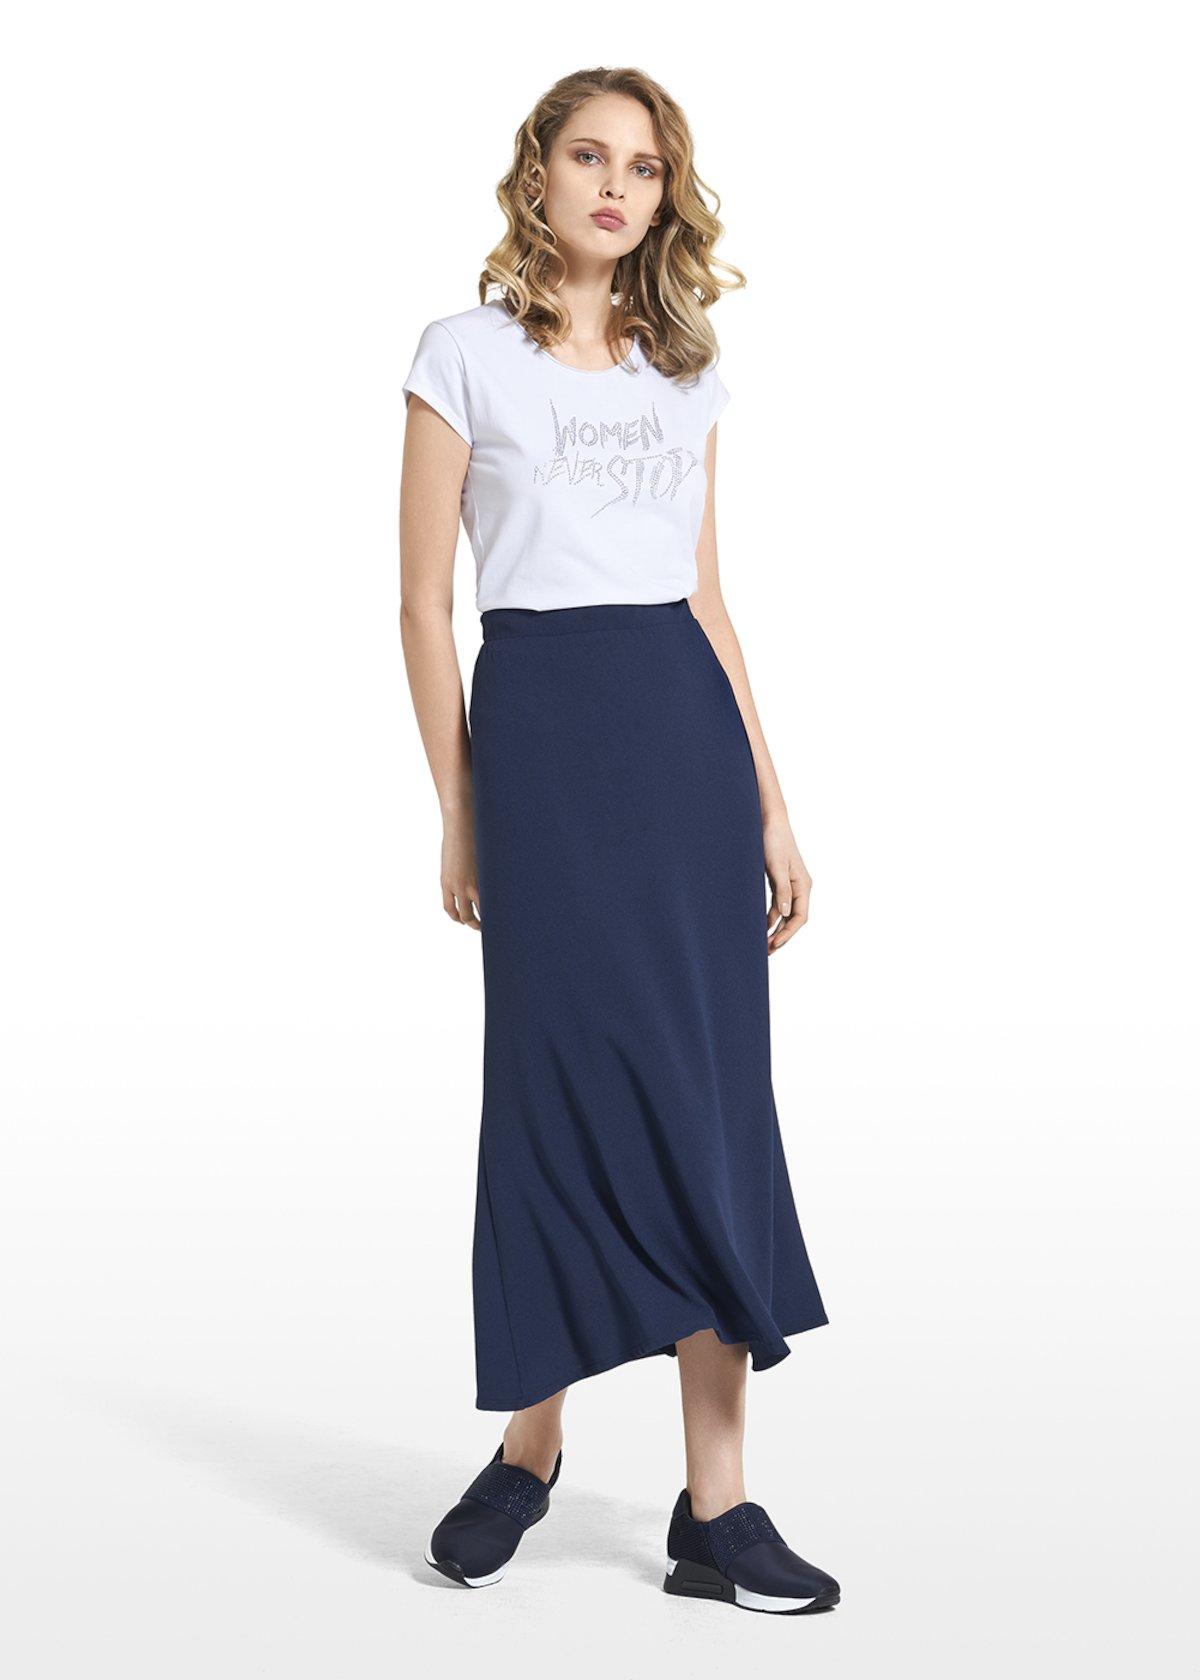 T-shirt Soledad with print